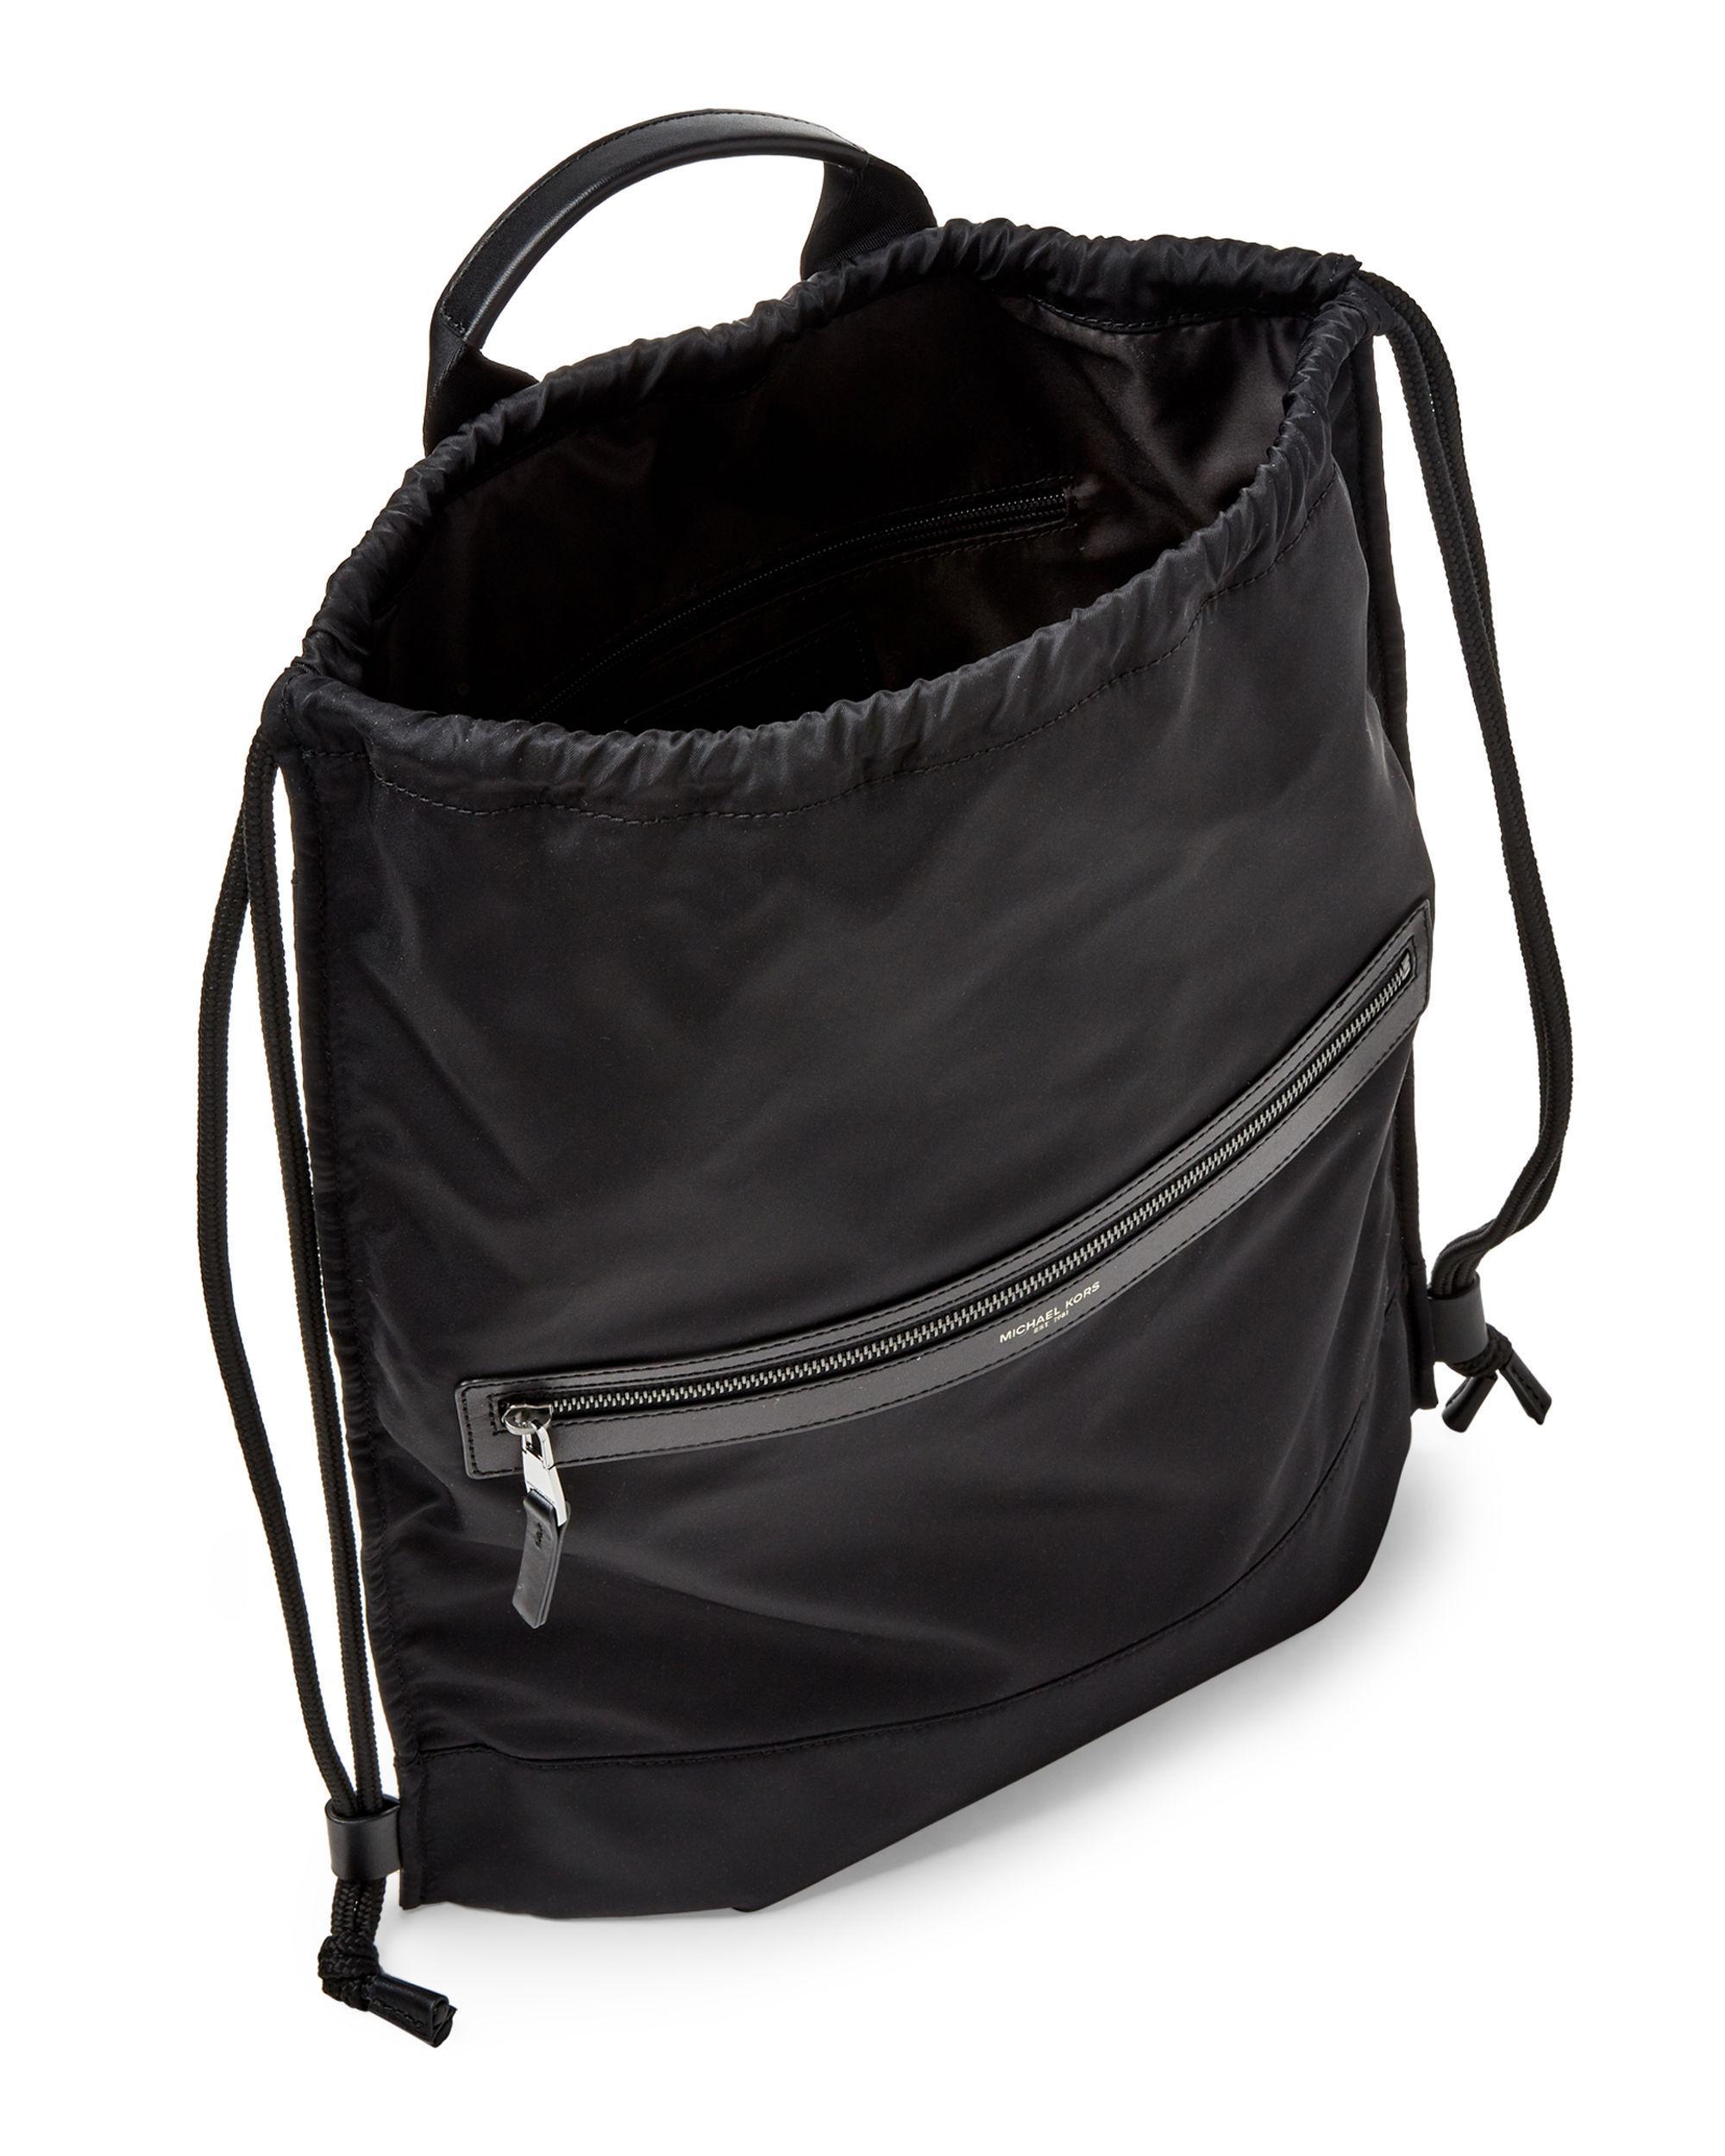 98f581021742 Michael Kors Black Kent Flat Drawstring Backpack in Black for Men - Lyst